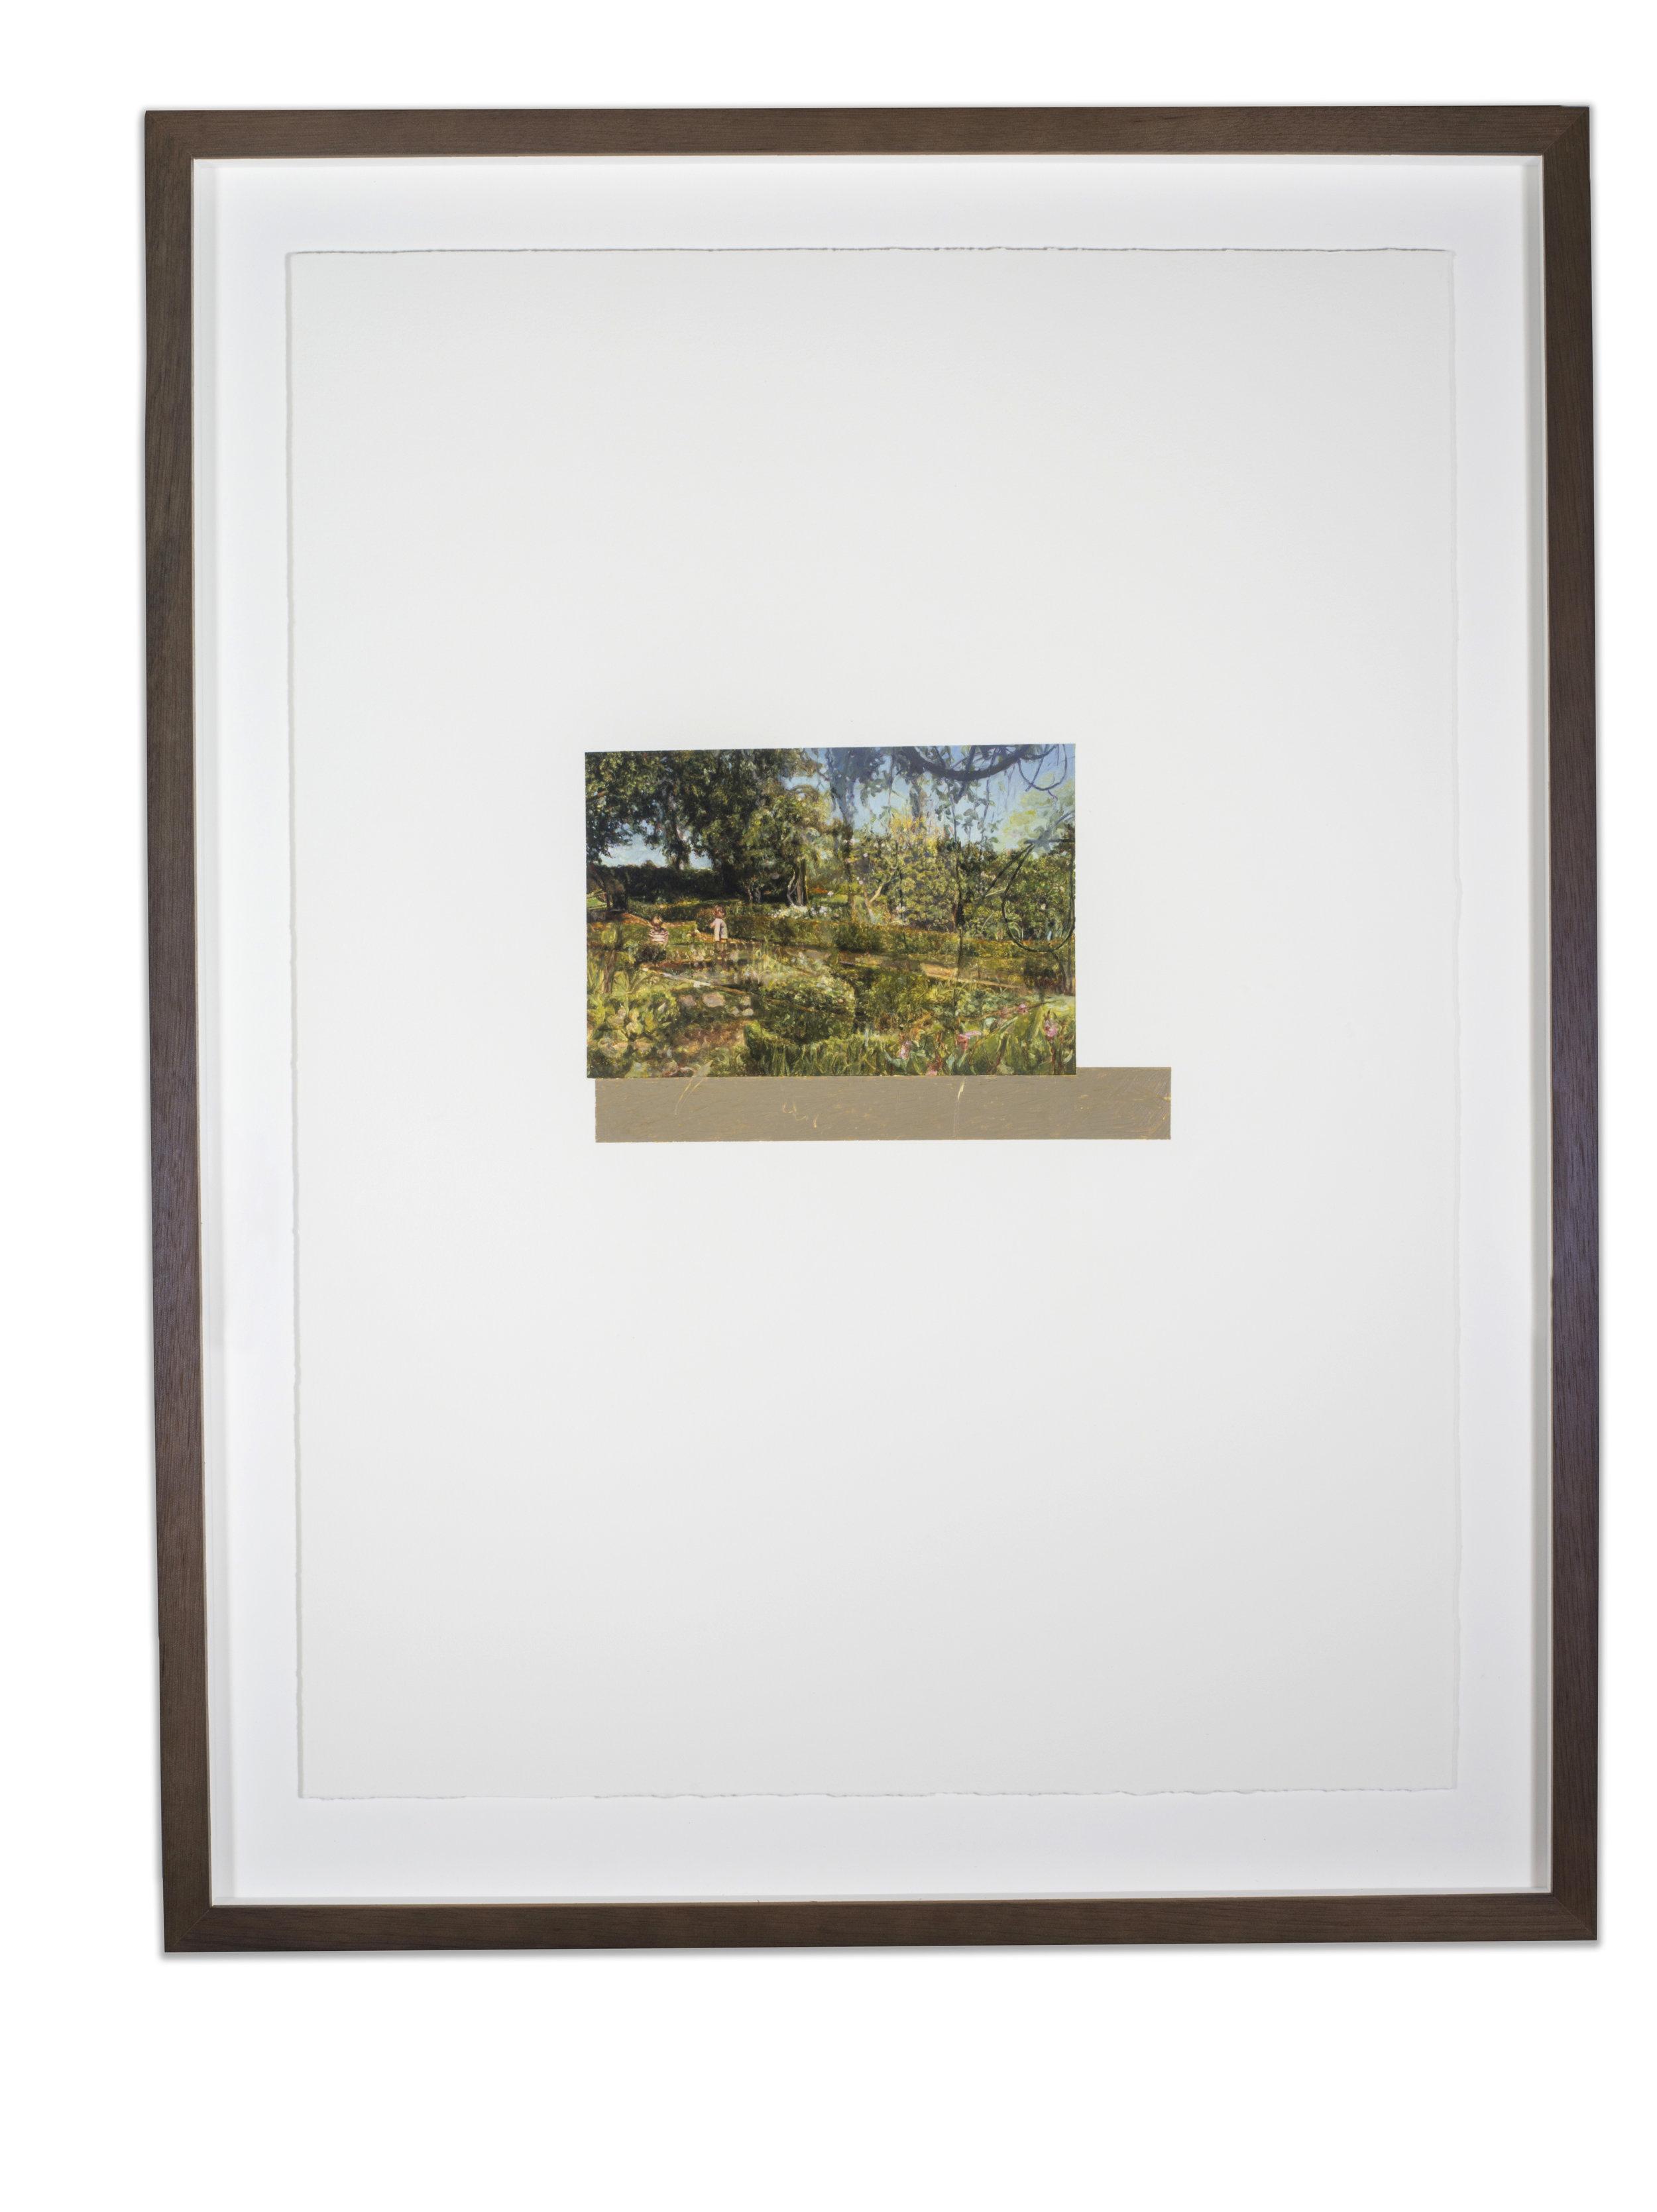 Built Environment #2, oil on paper, 67 x 50 cm (image 17 x 25 cm), 2016. (Collection Queensland University of Technology Art Museum).